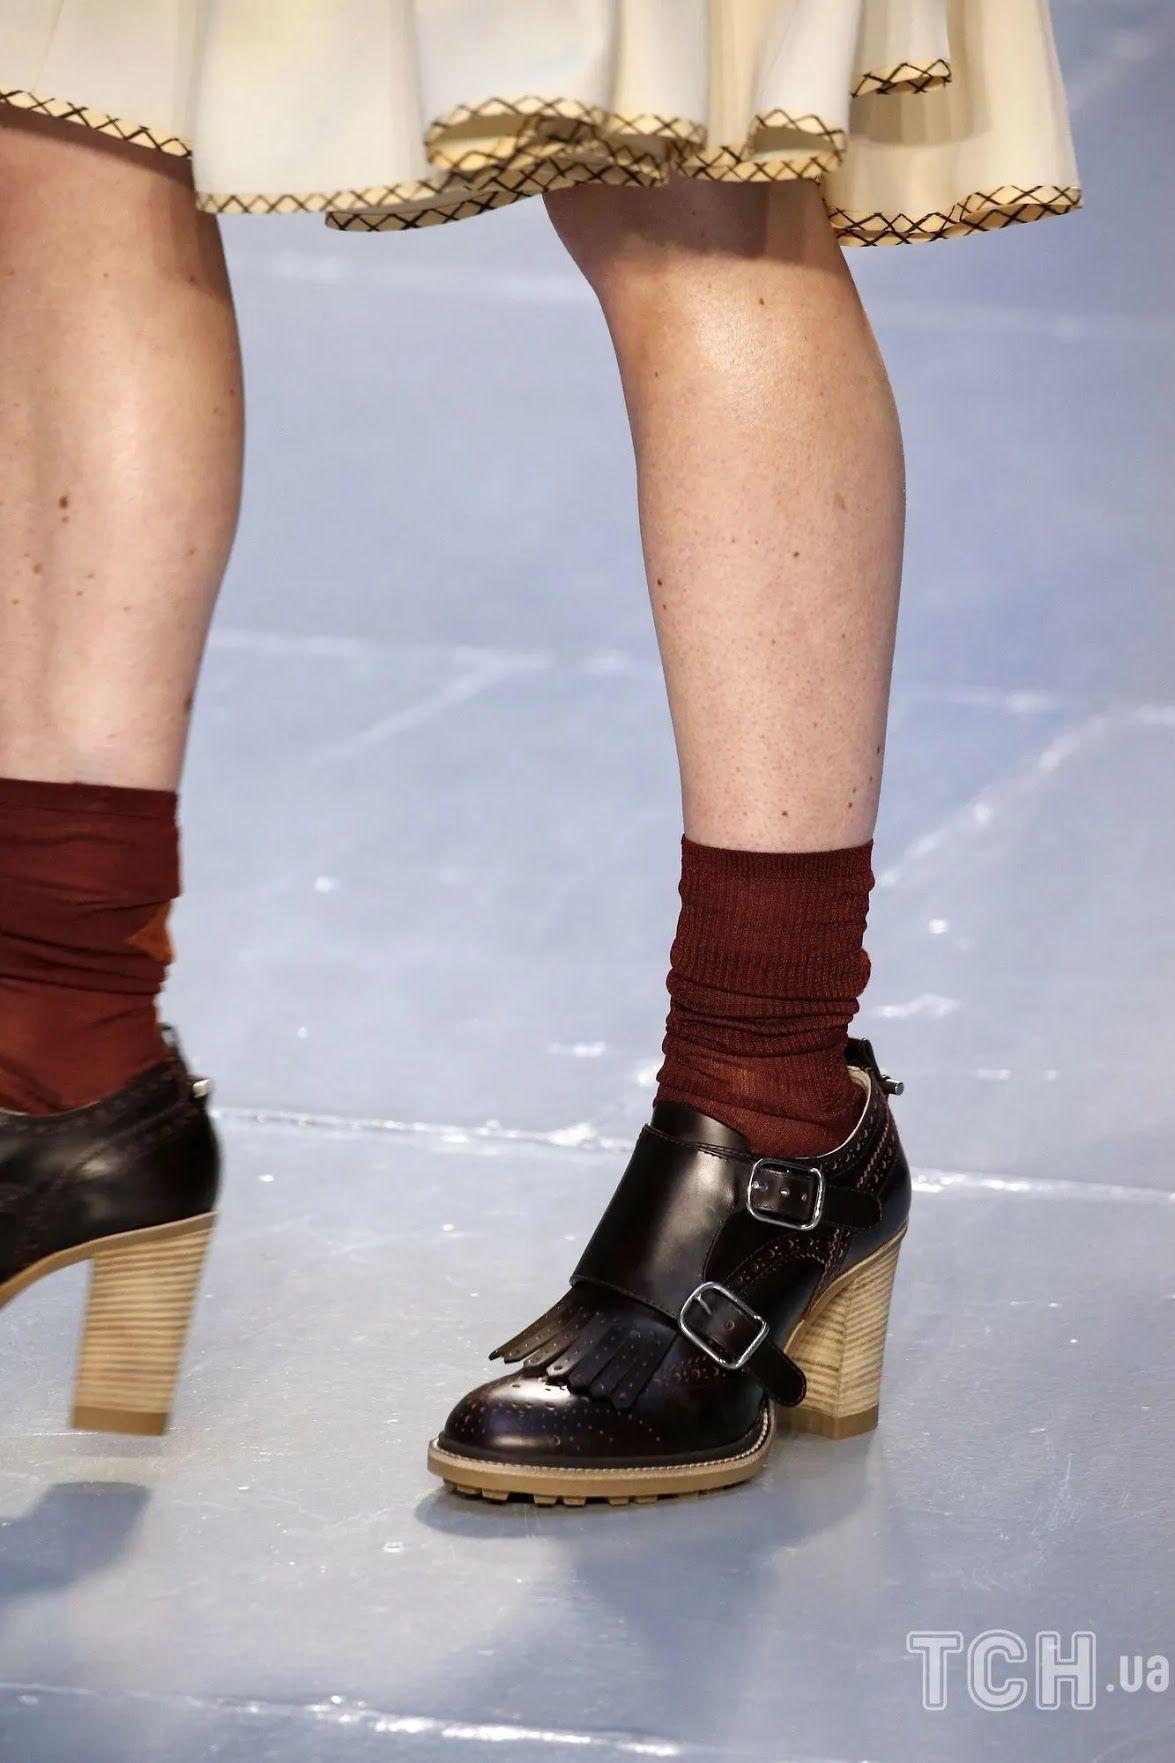 Туфли и босоножки с носками